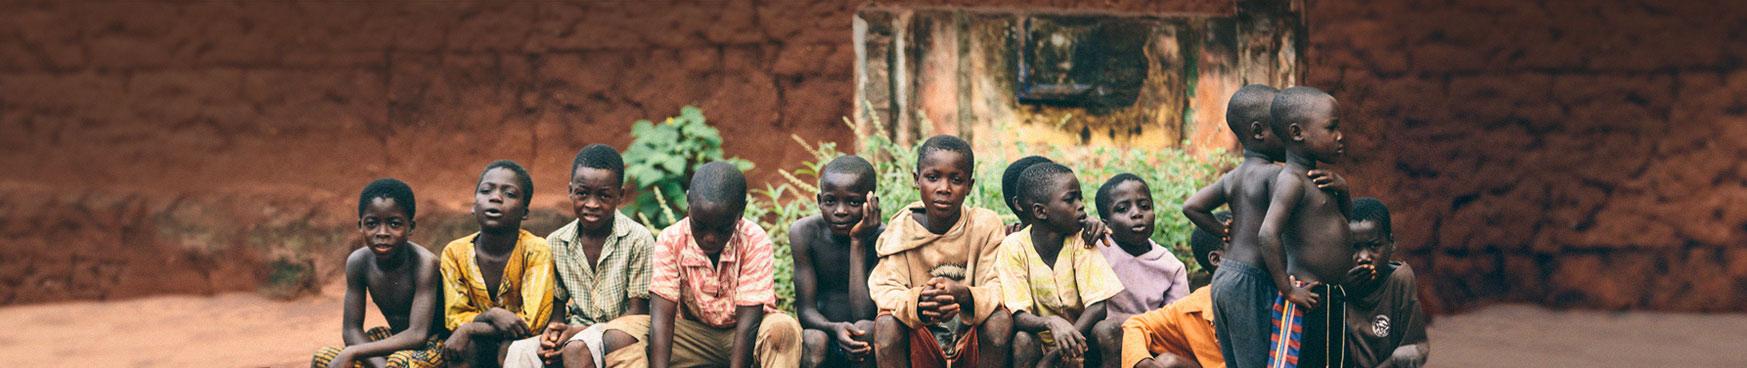 Malawi Dreaming